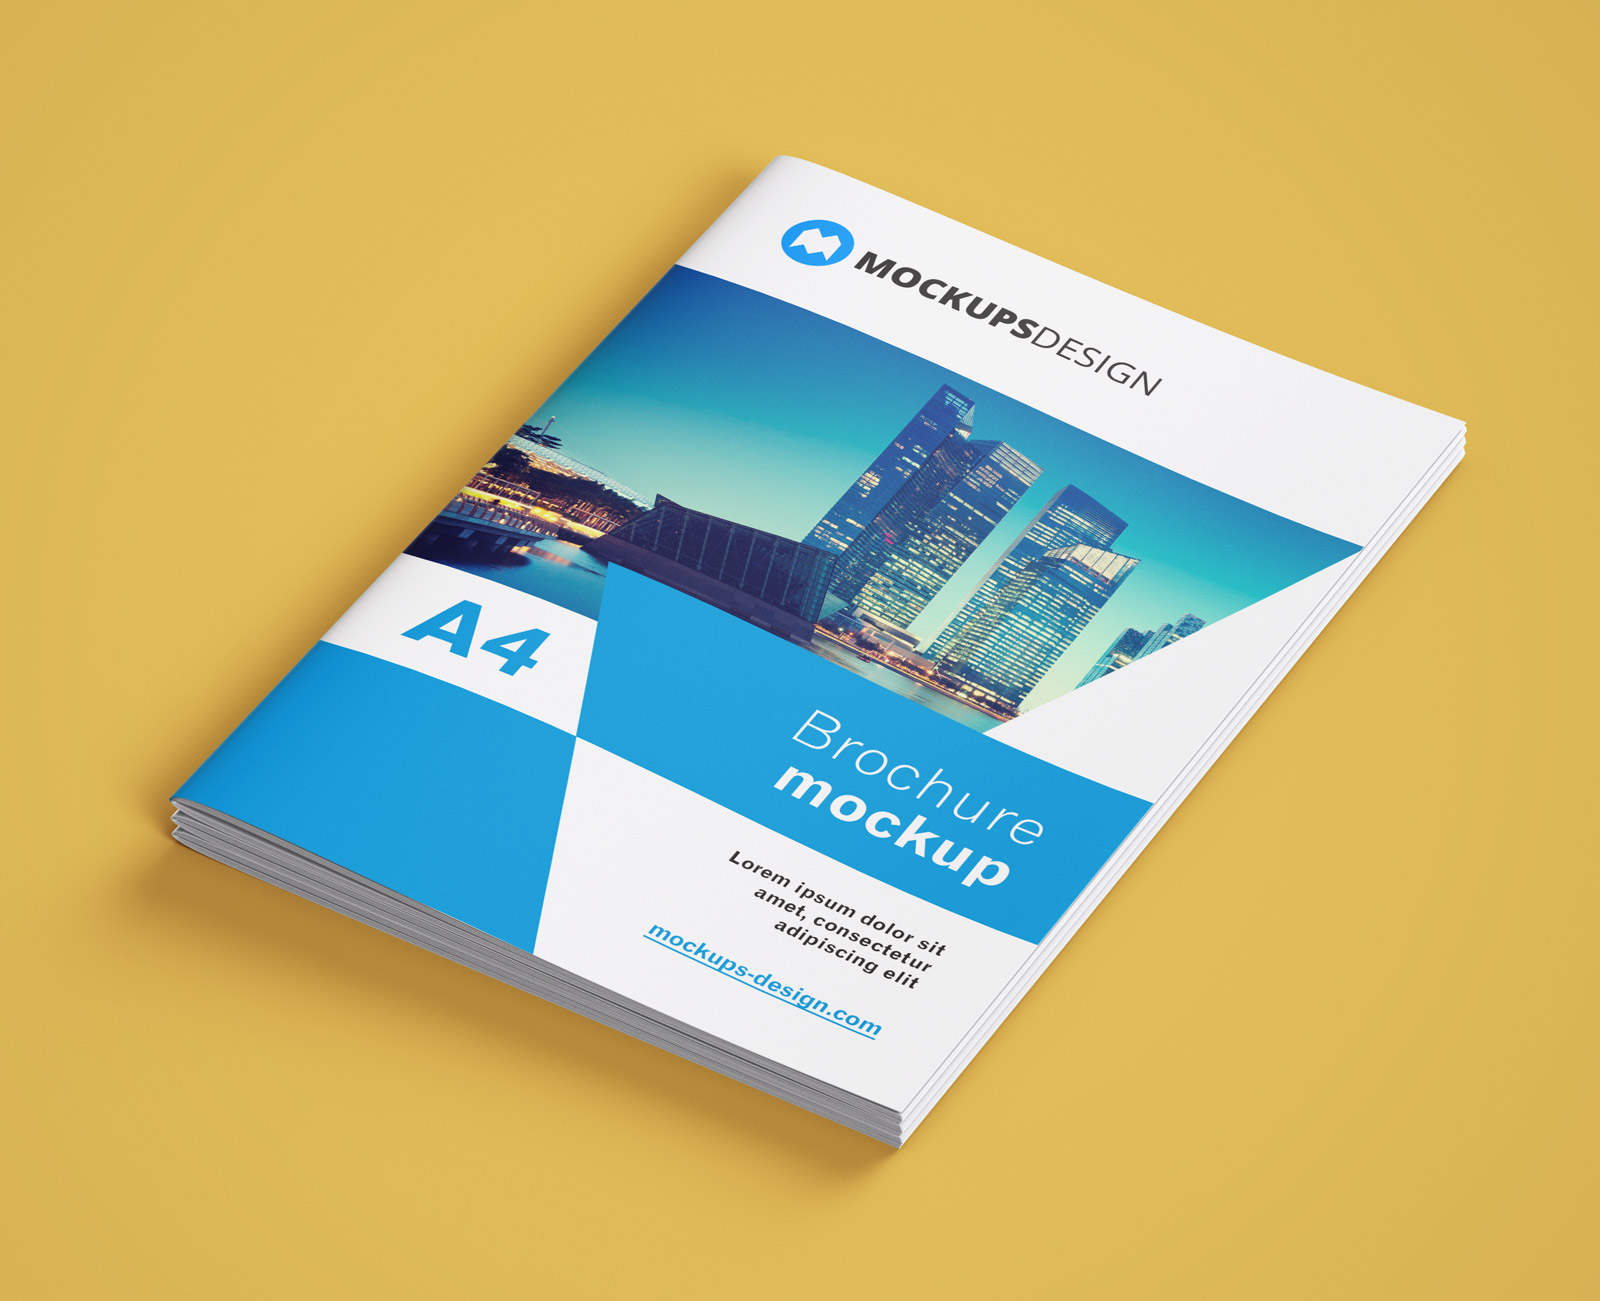 Free A4 Brochure Company Profile Mockup PSD (1)